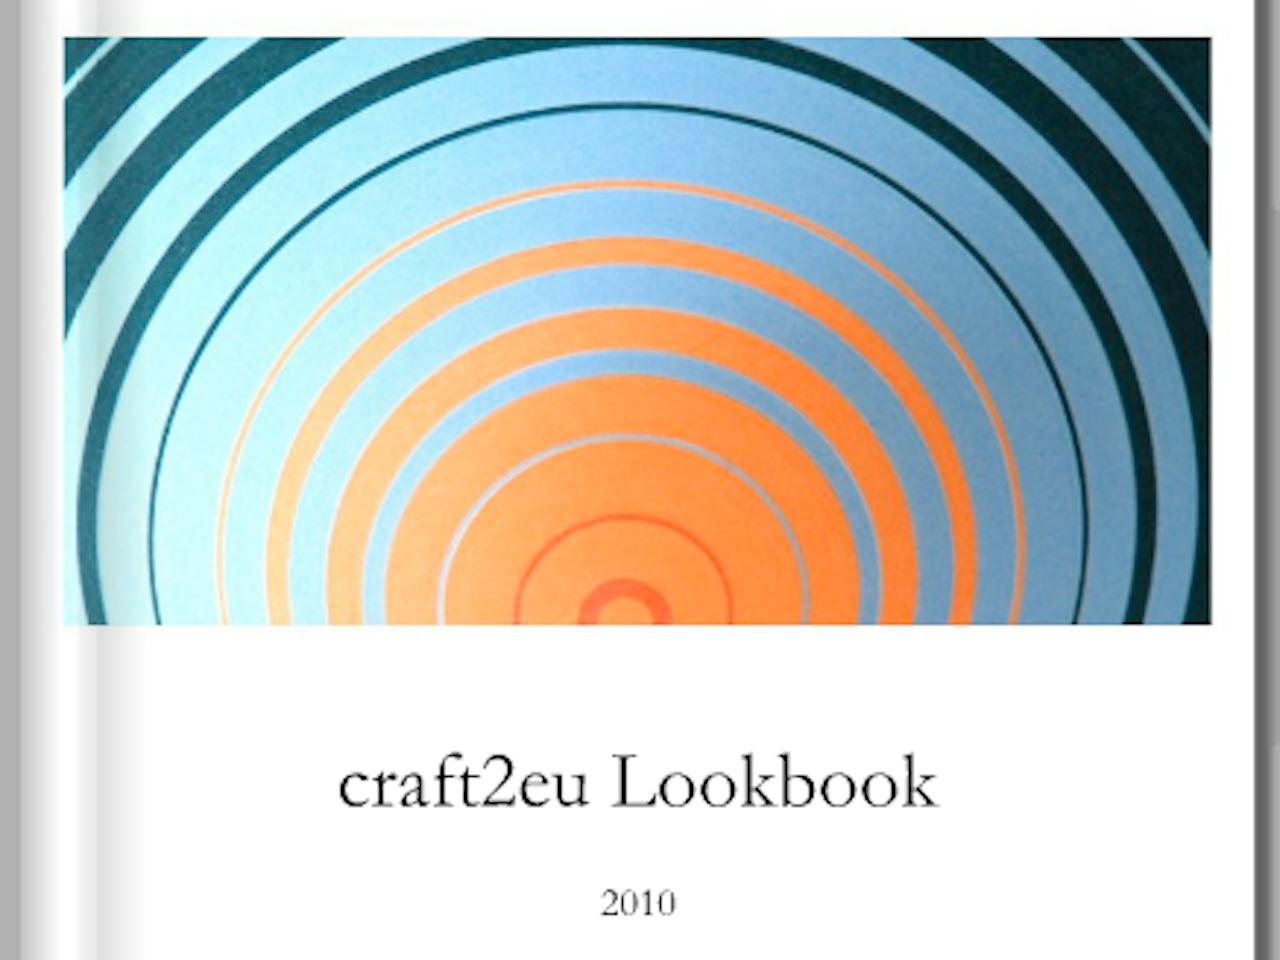 craft2eu LOOKBOOKs 2004-2014